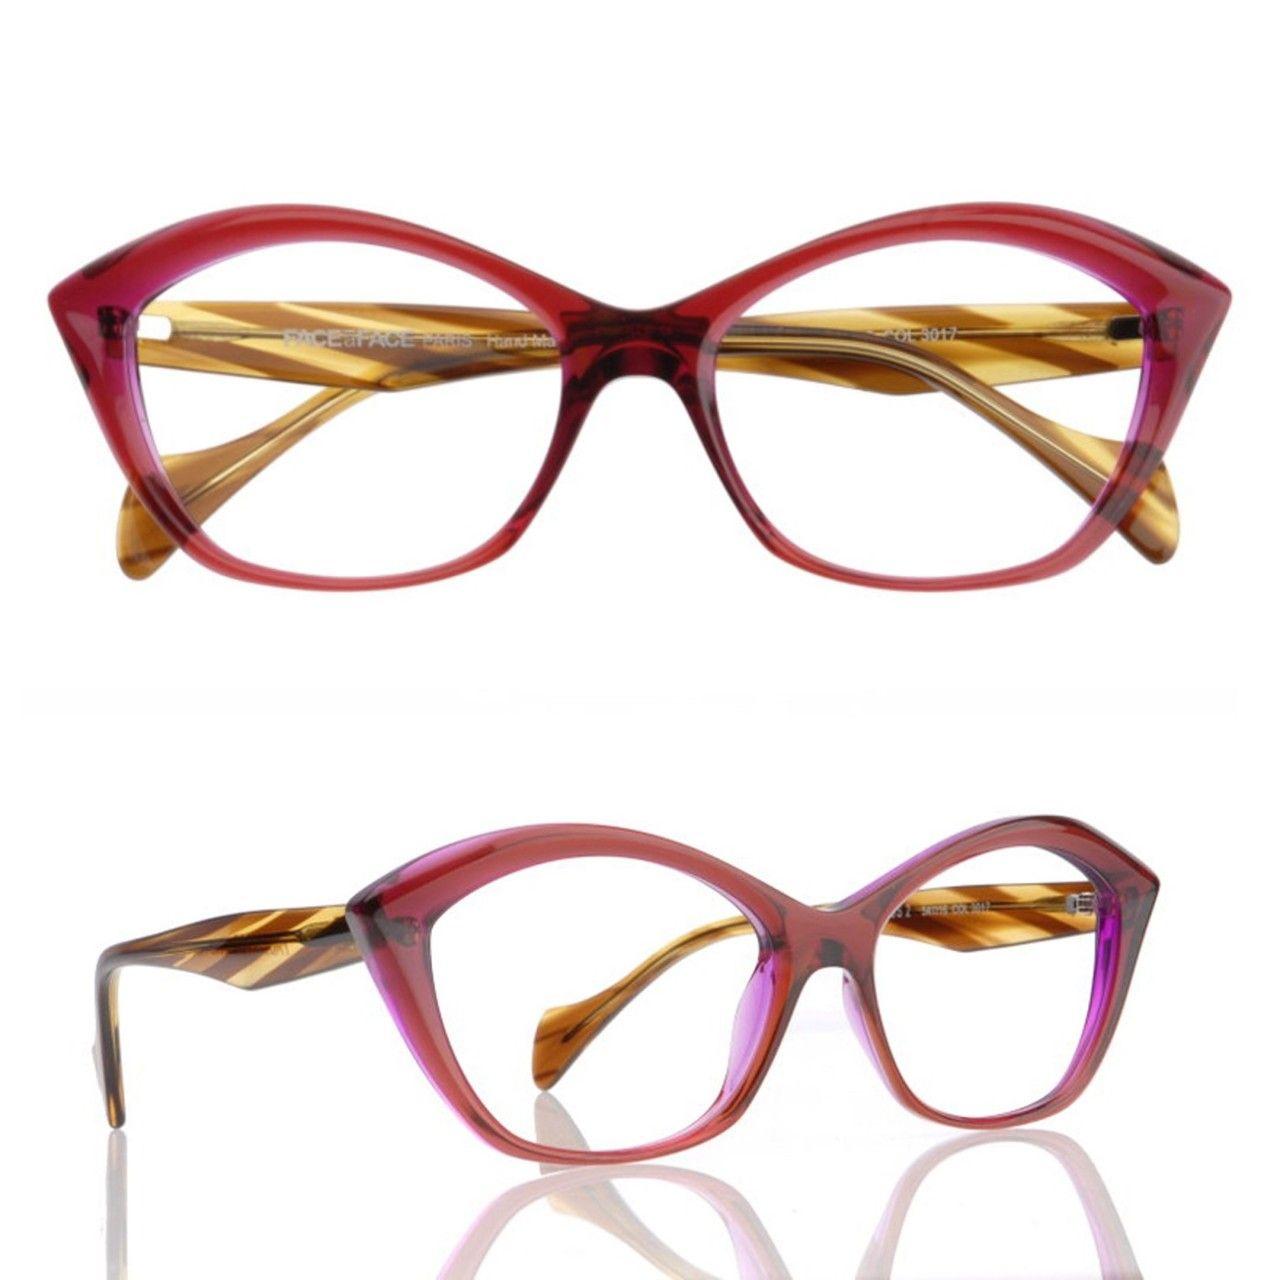 INESS 2 | Face a Face | Designer Face a Face eyewear | Acetate Eyeglasses